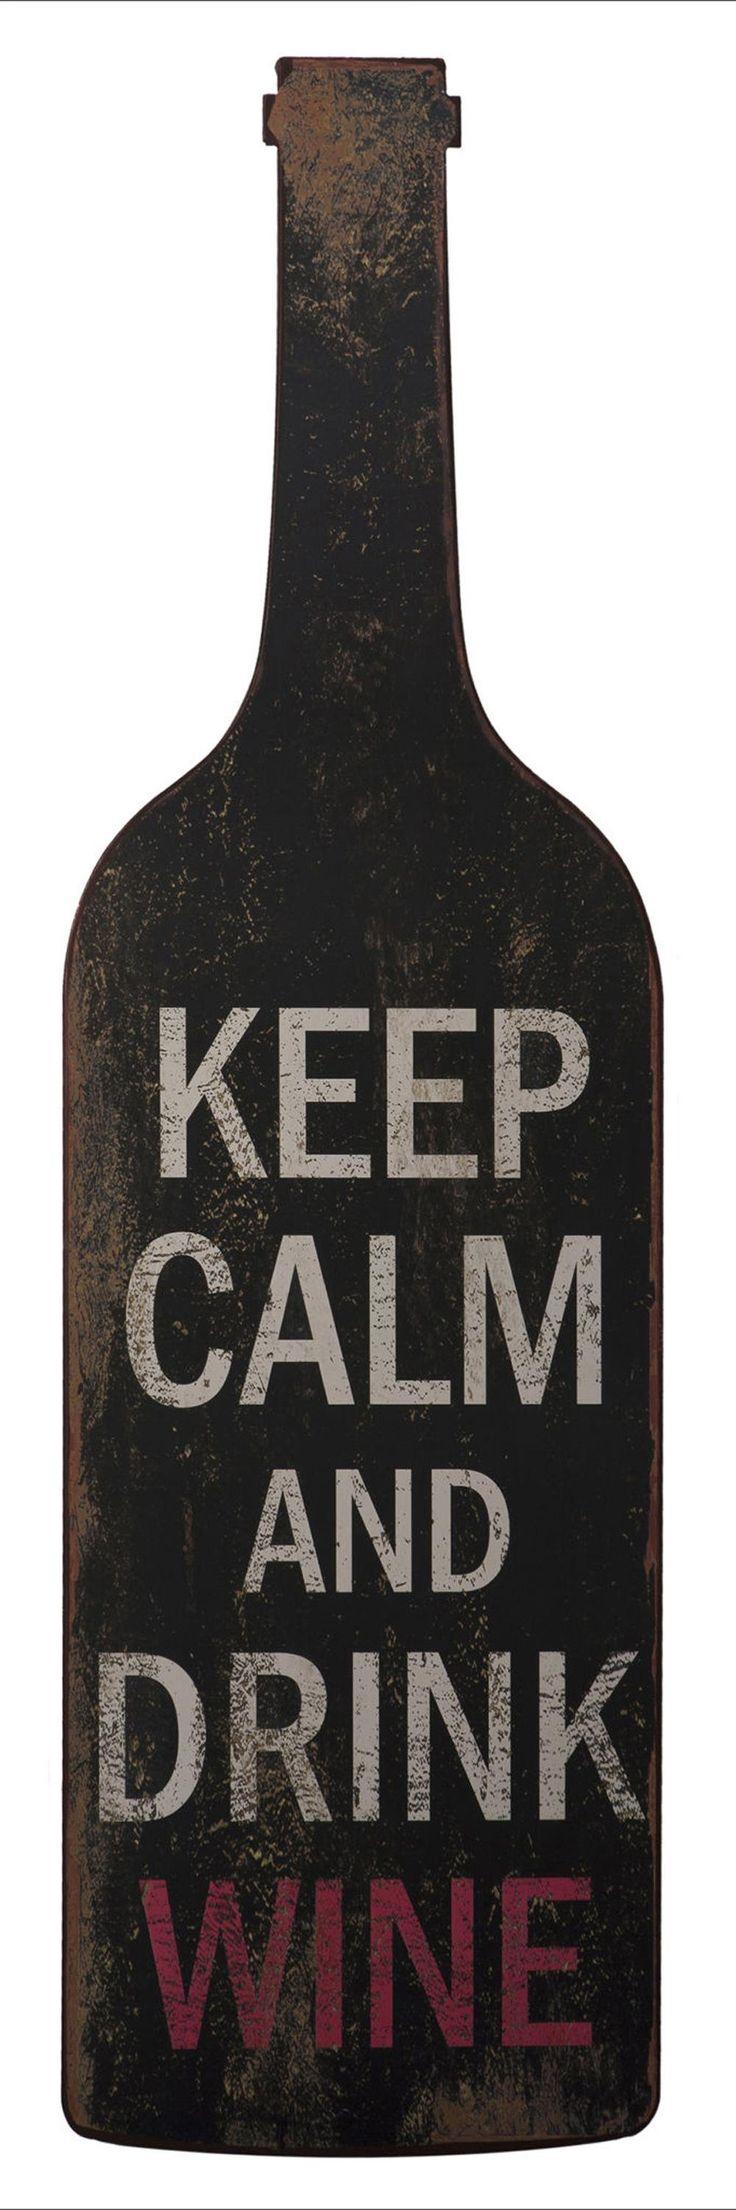 Keep calm and drink wine. duhhhhhh